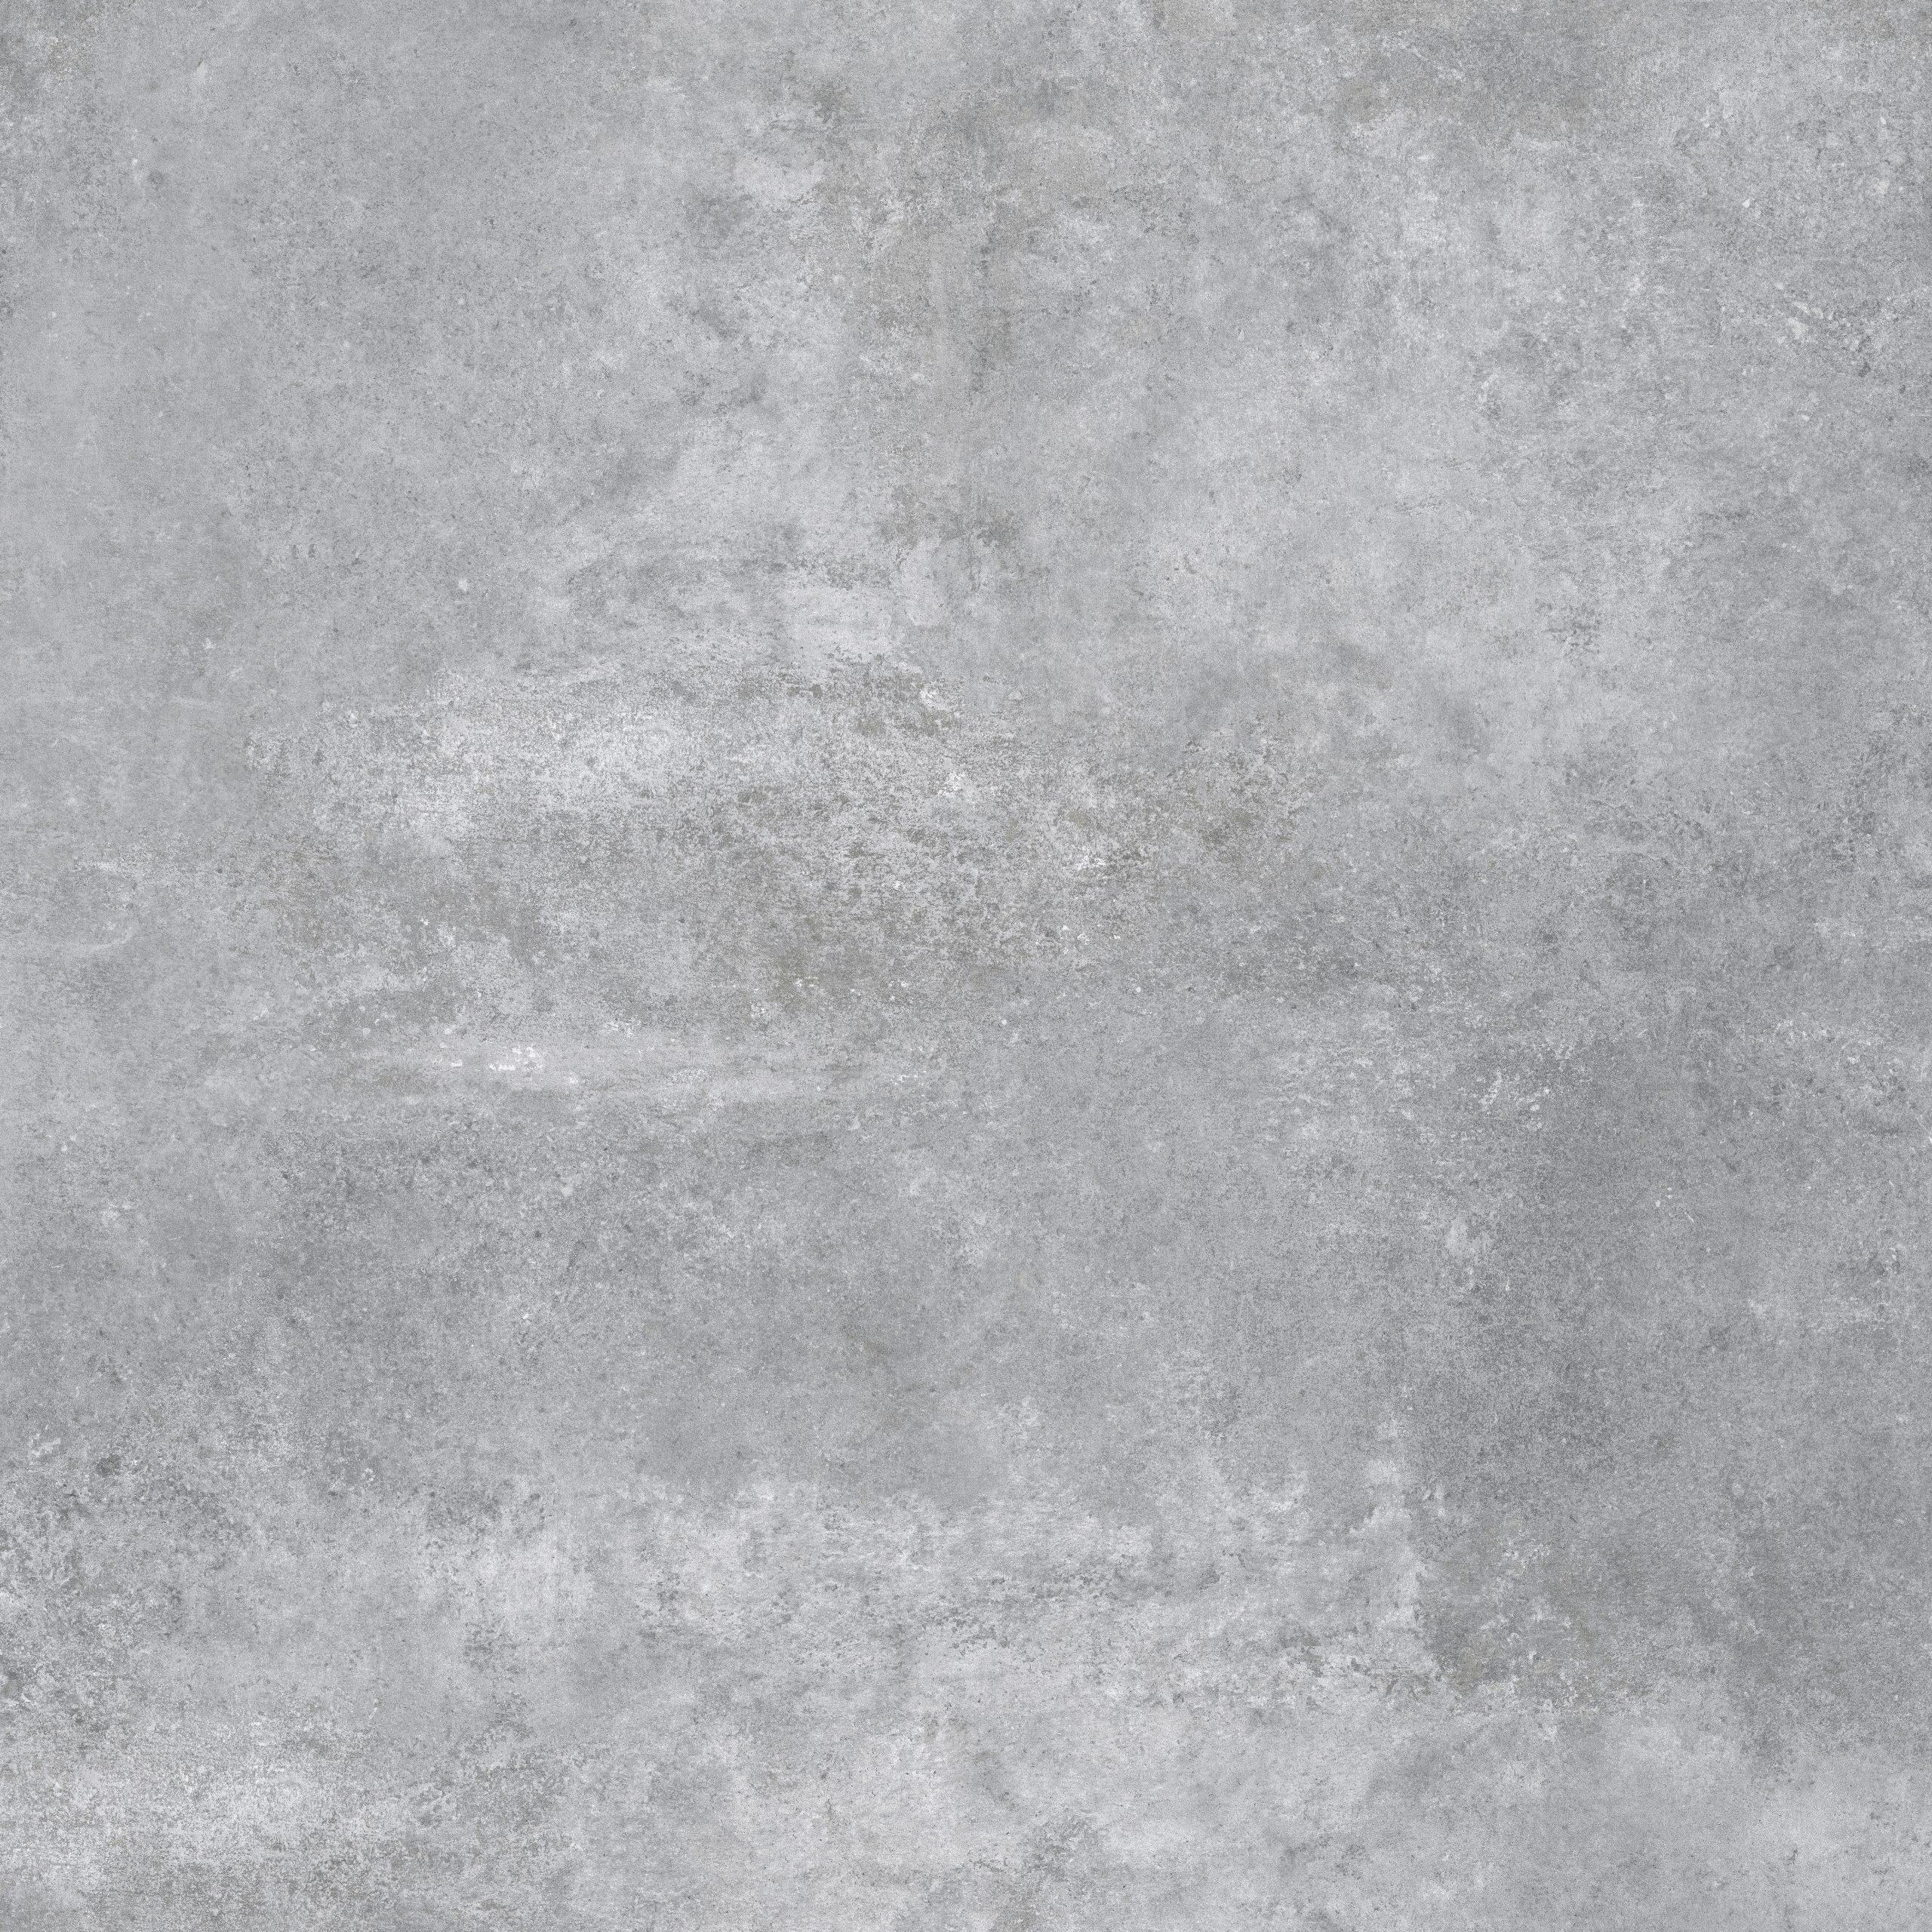 Lifestone Grey 90x90